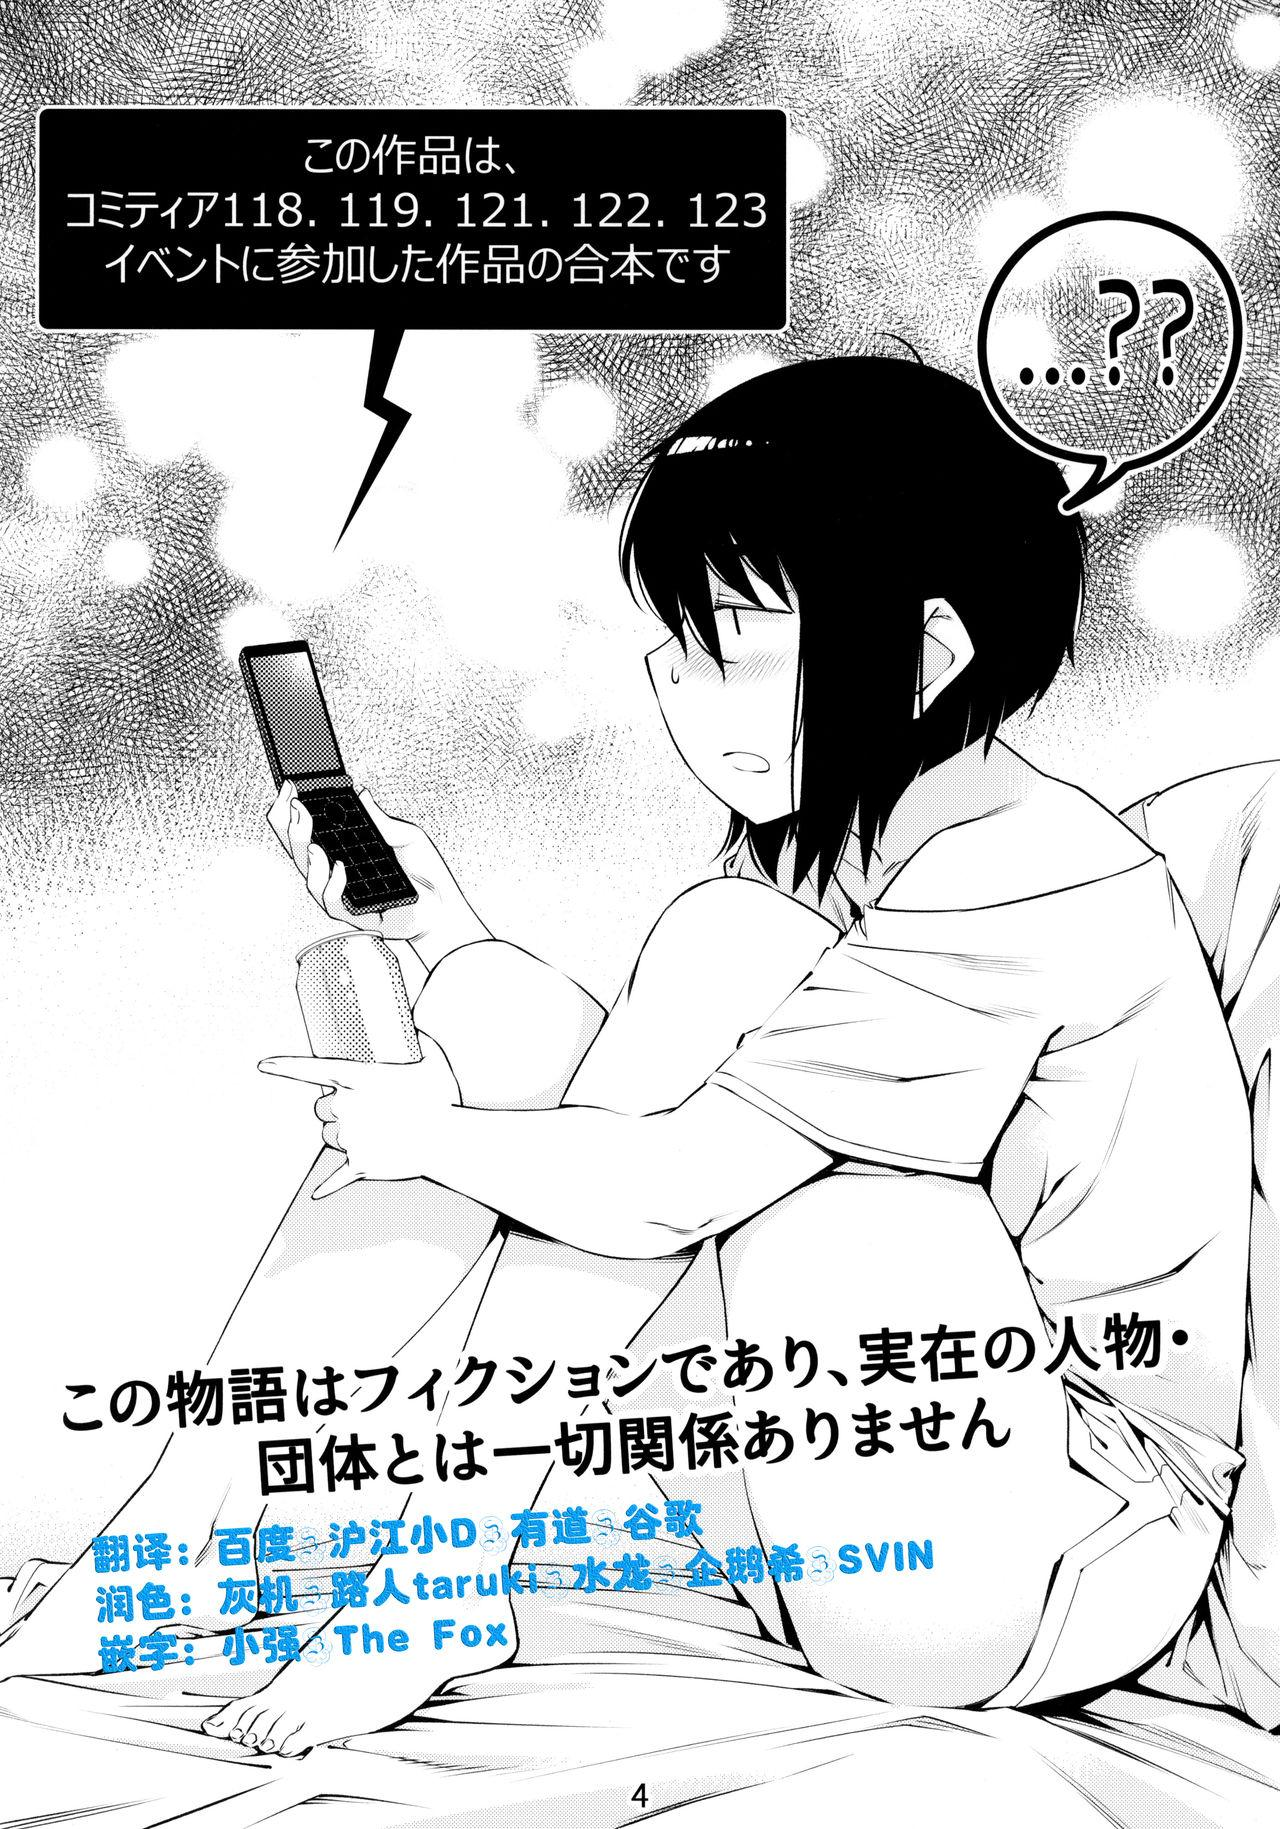 Otonano Omochiya 6 Kan 3